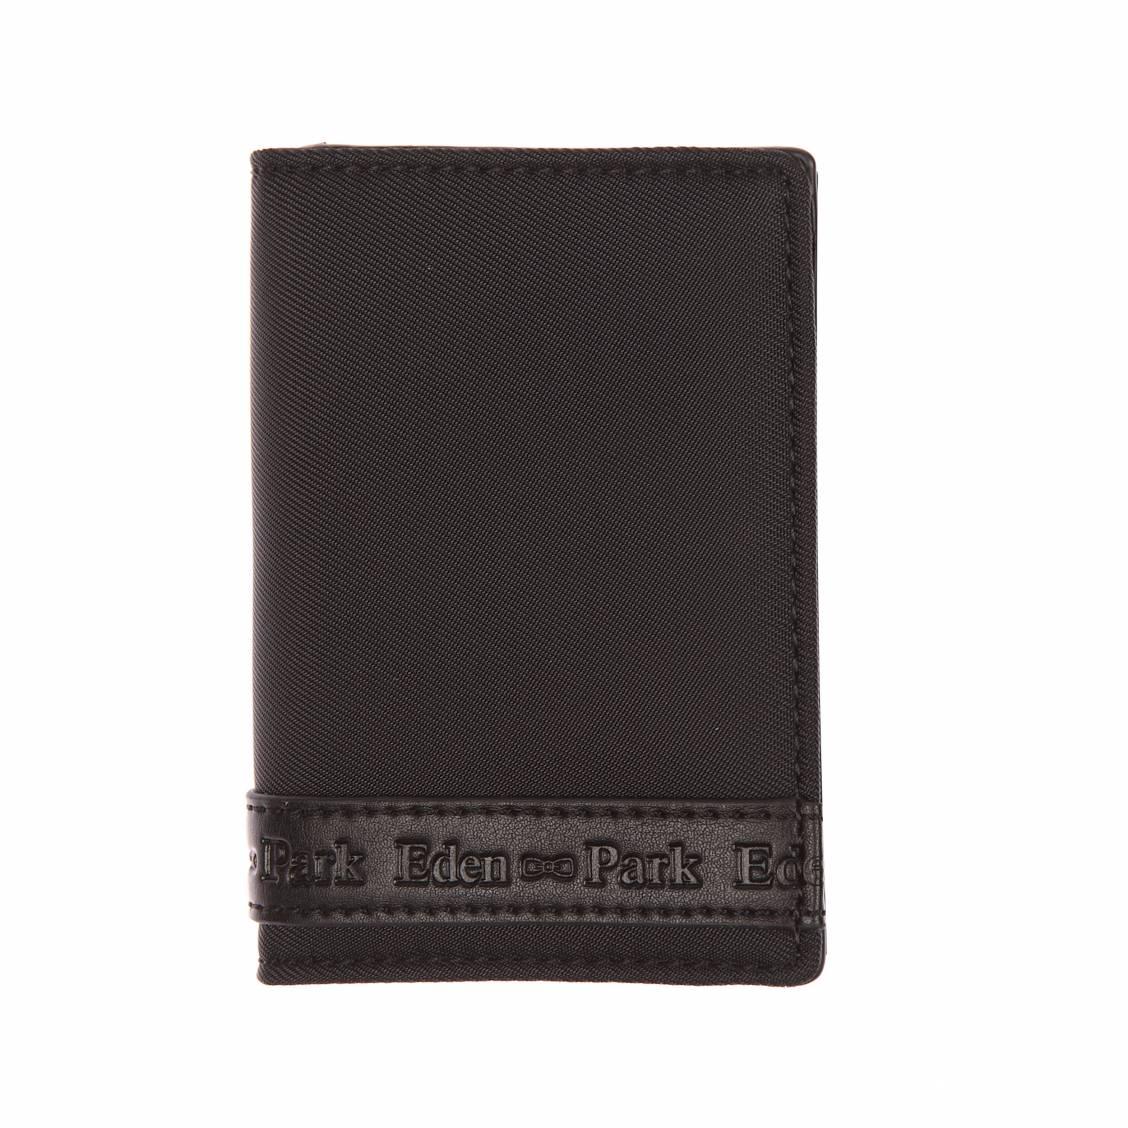 Portefeuille européen 2 volets  noir en tissu et cuir monogrammé